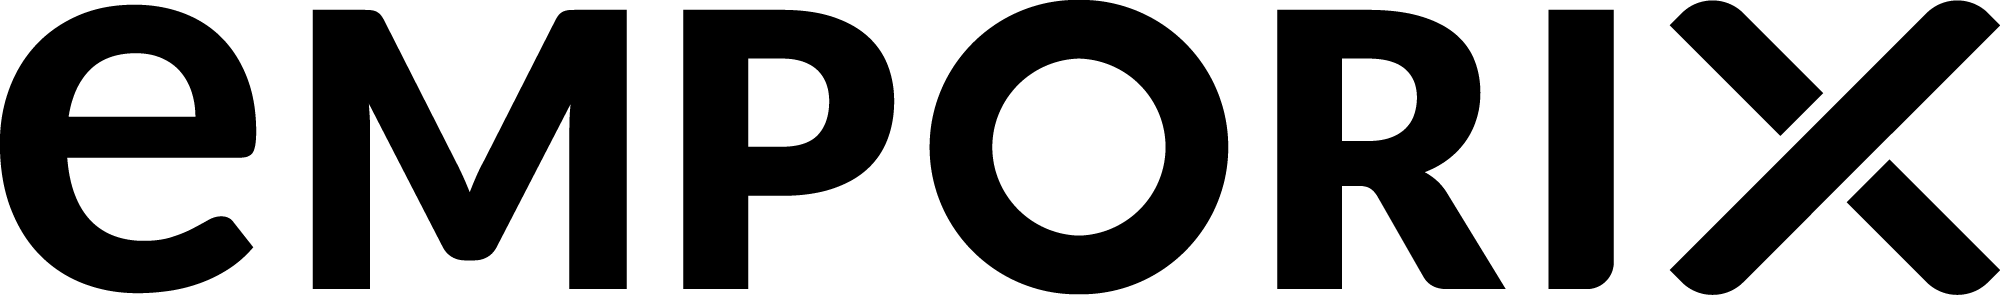 emporix text 2000px (1)